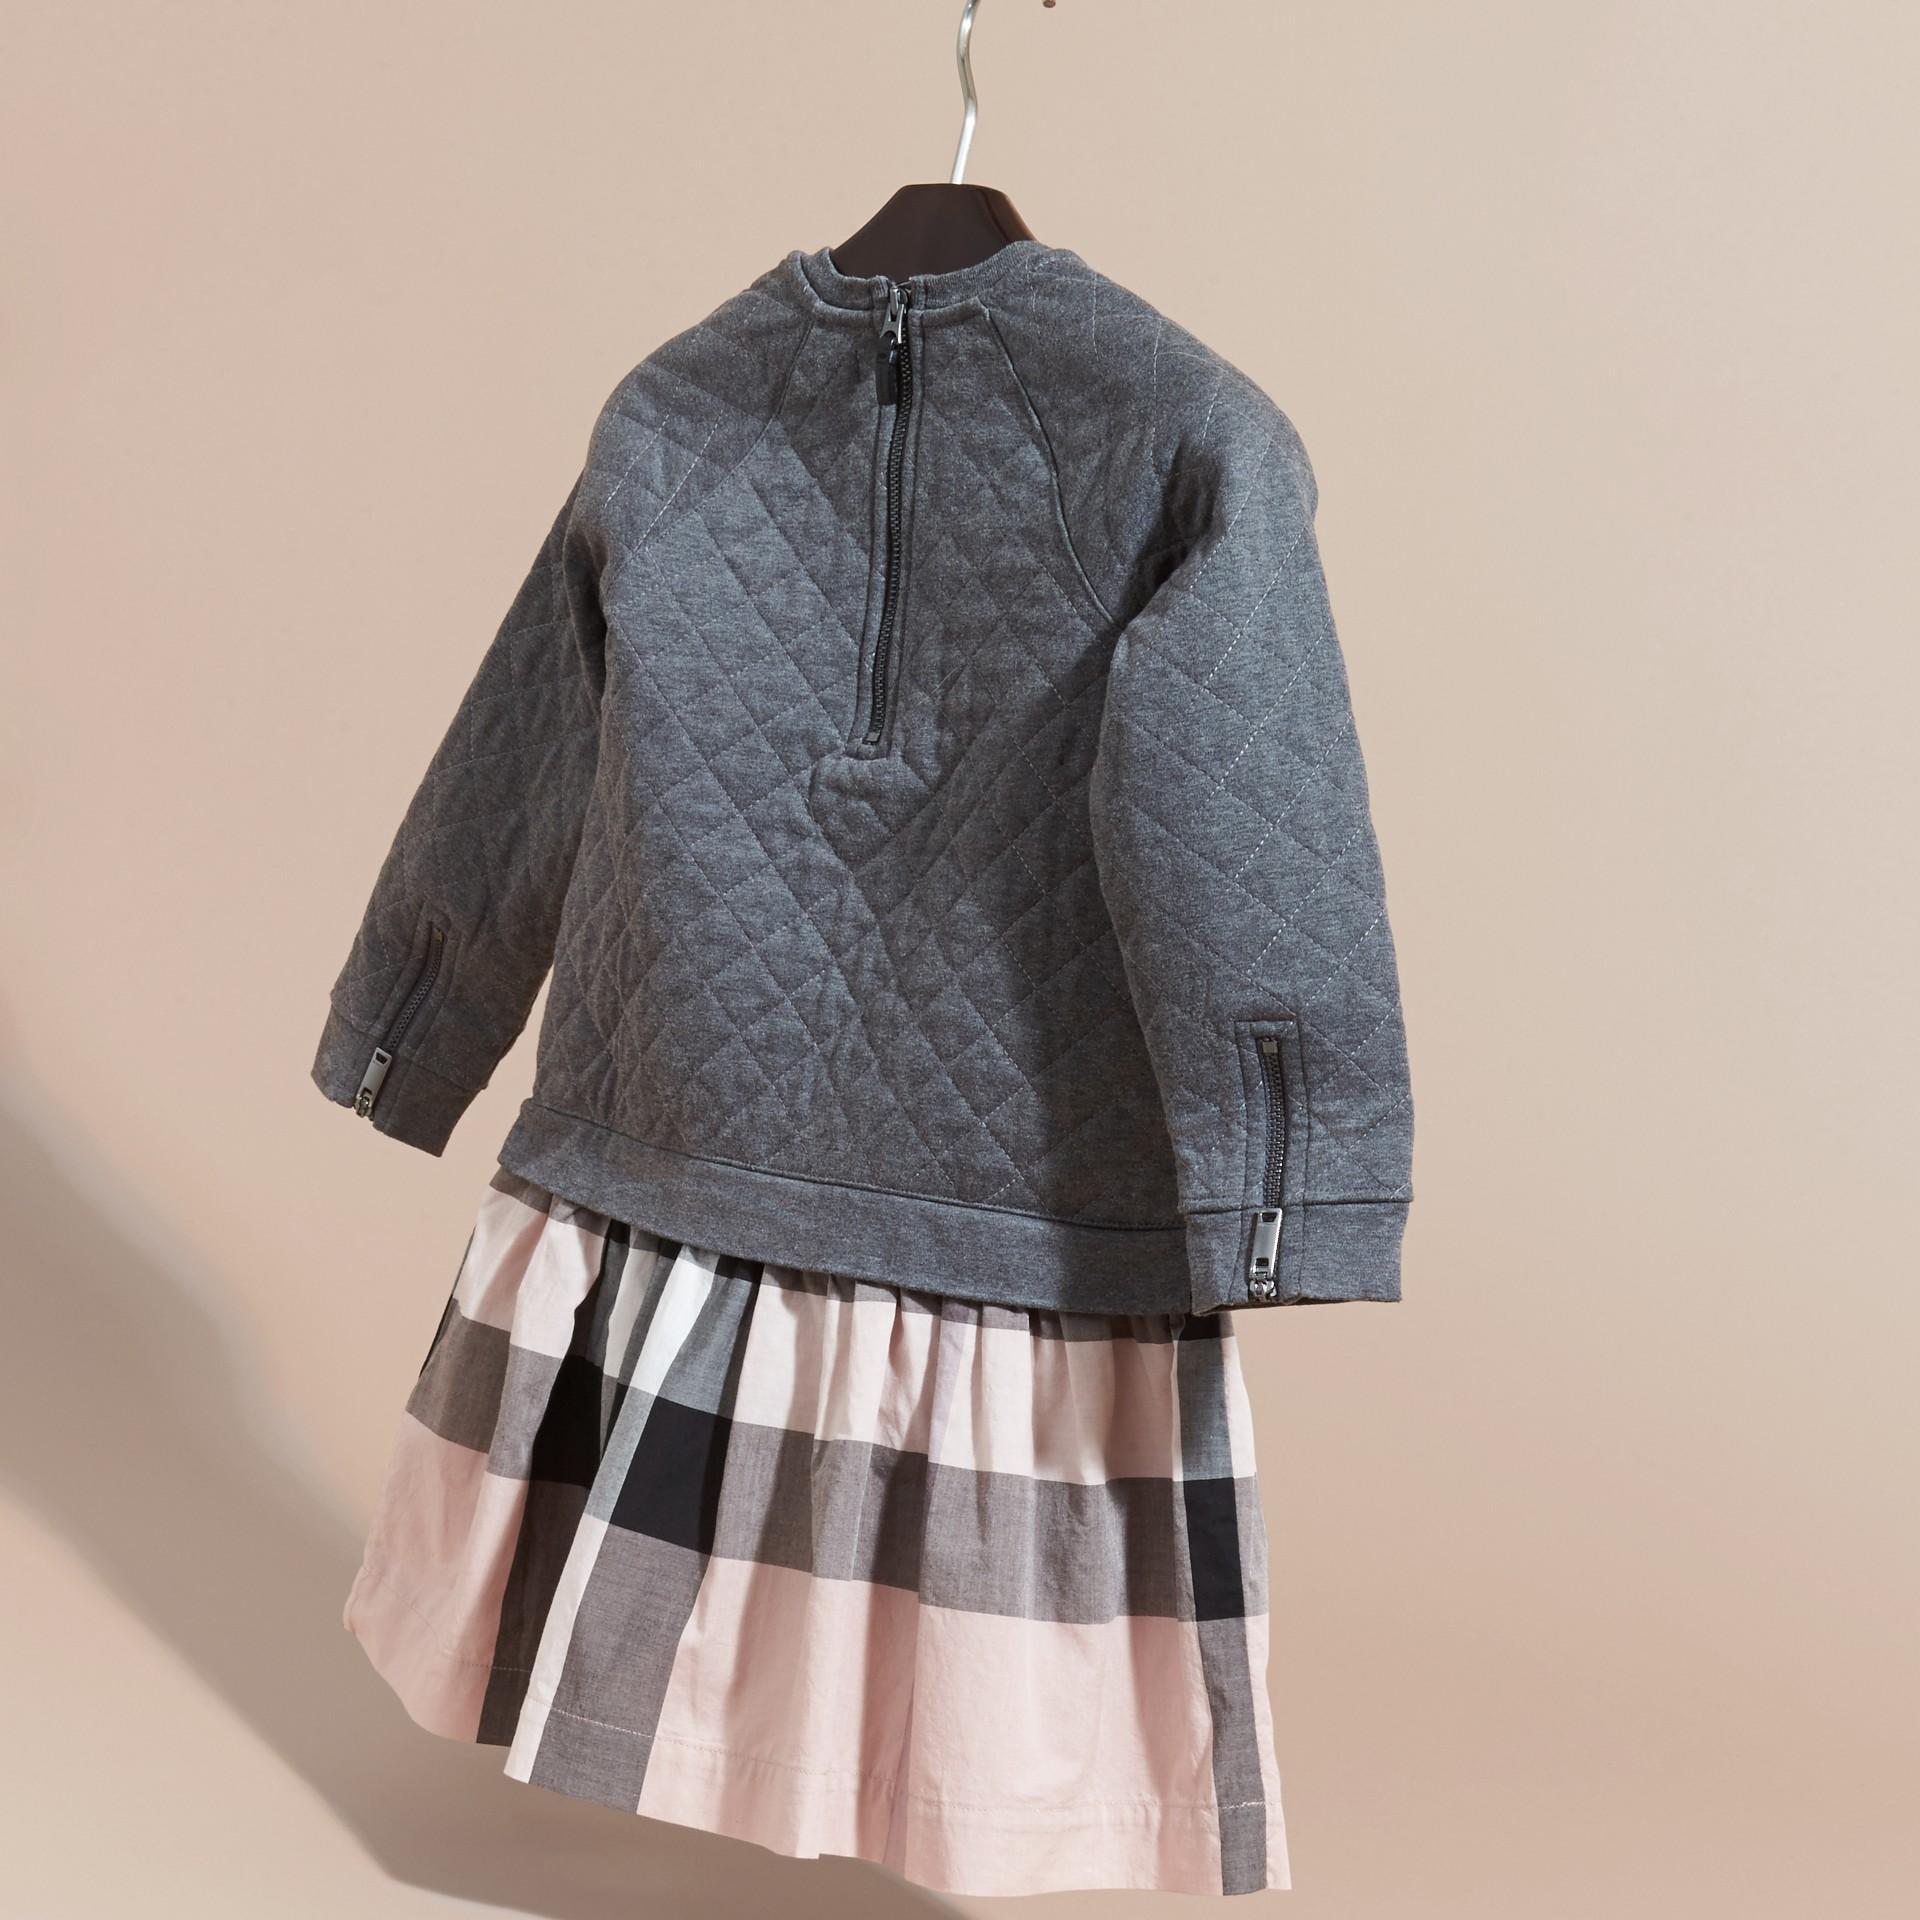 Dark grey melange Quilted Jersey and Check Cotton Day Dress Dark Grey Melange - gallery image 4